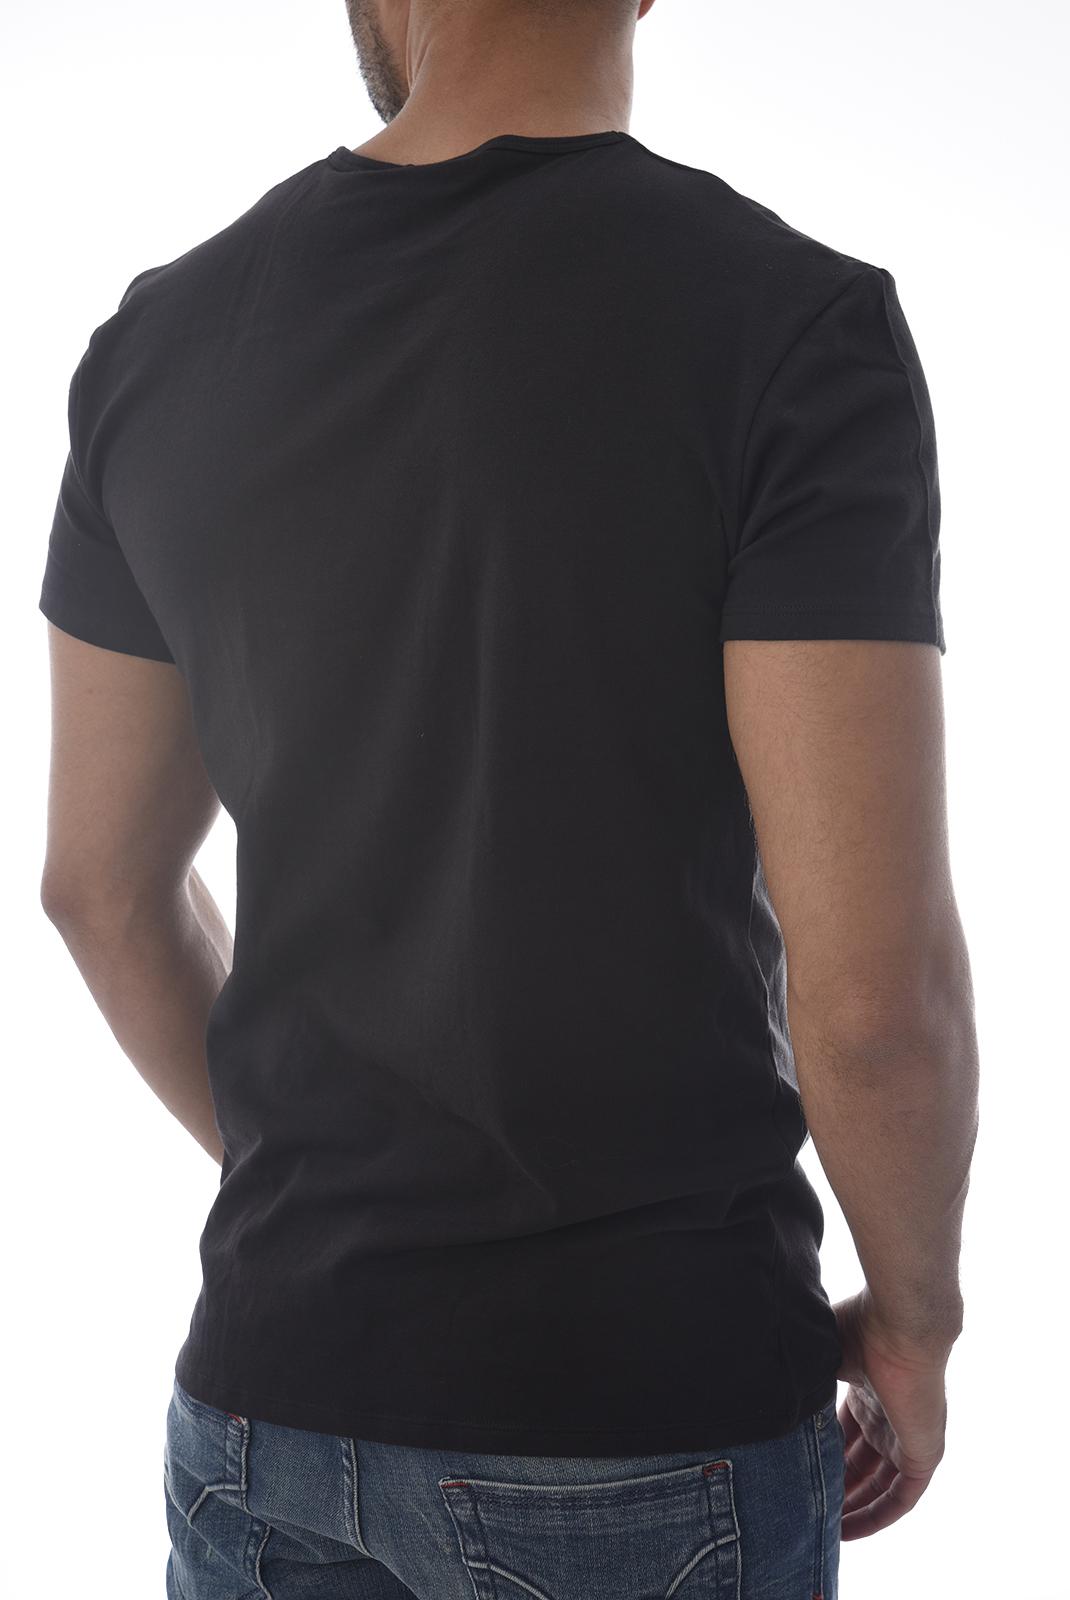 Tee-shirts  Fila F06G7 004-NERO